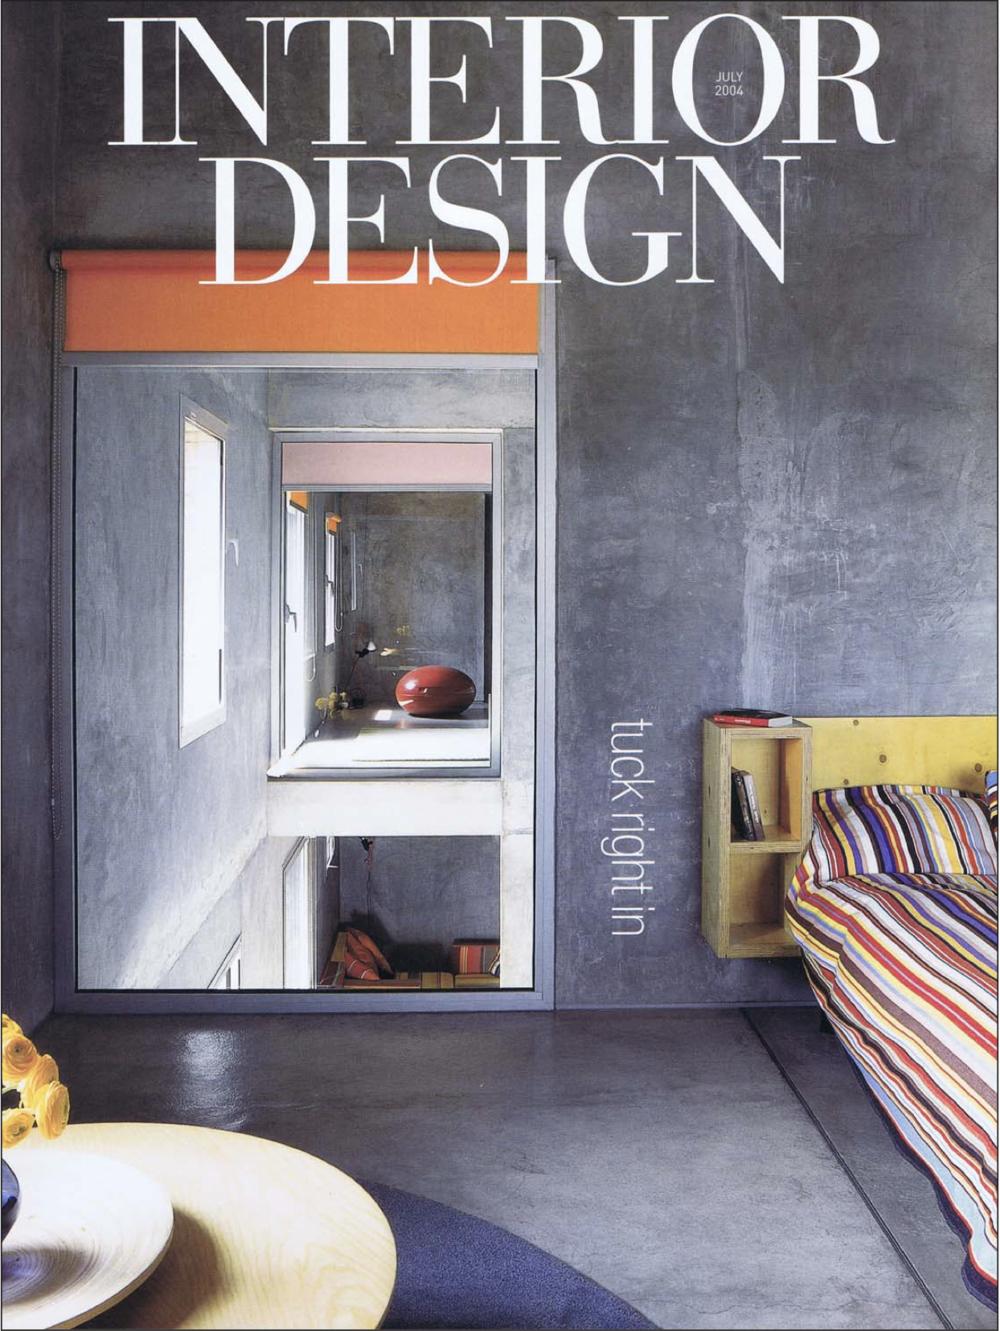 reeta-gyamlani-farrago-design-interior-design-magazine-2